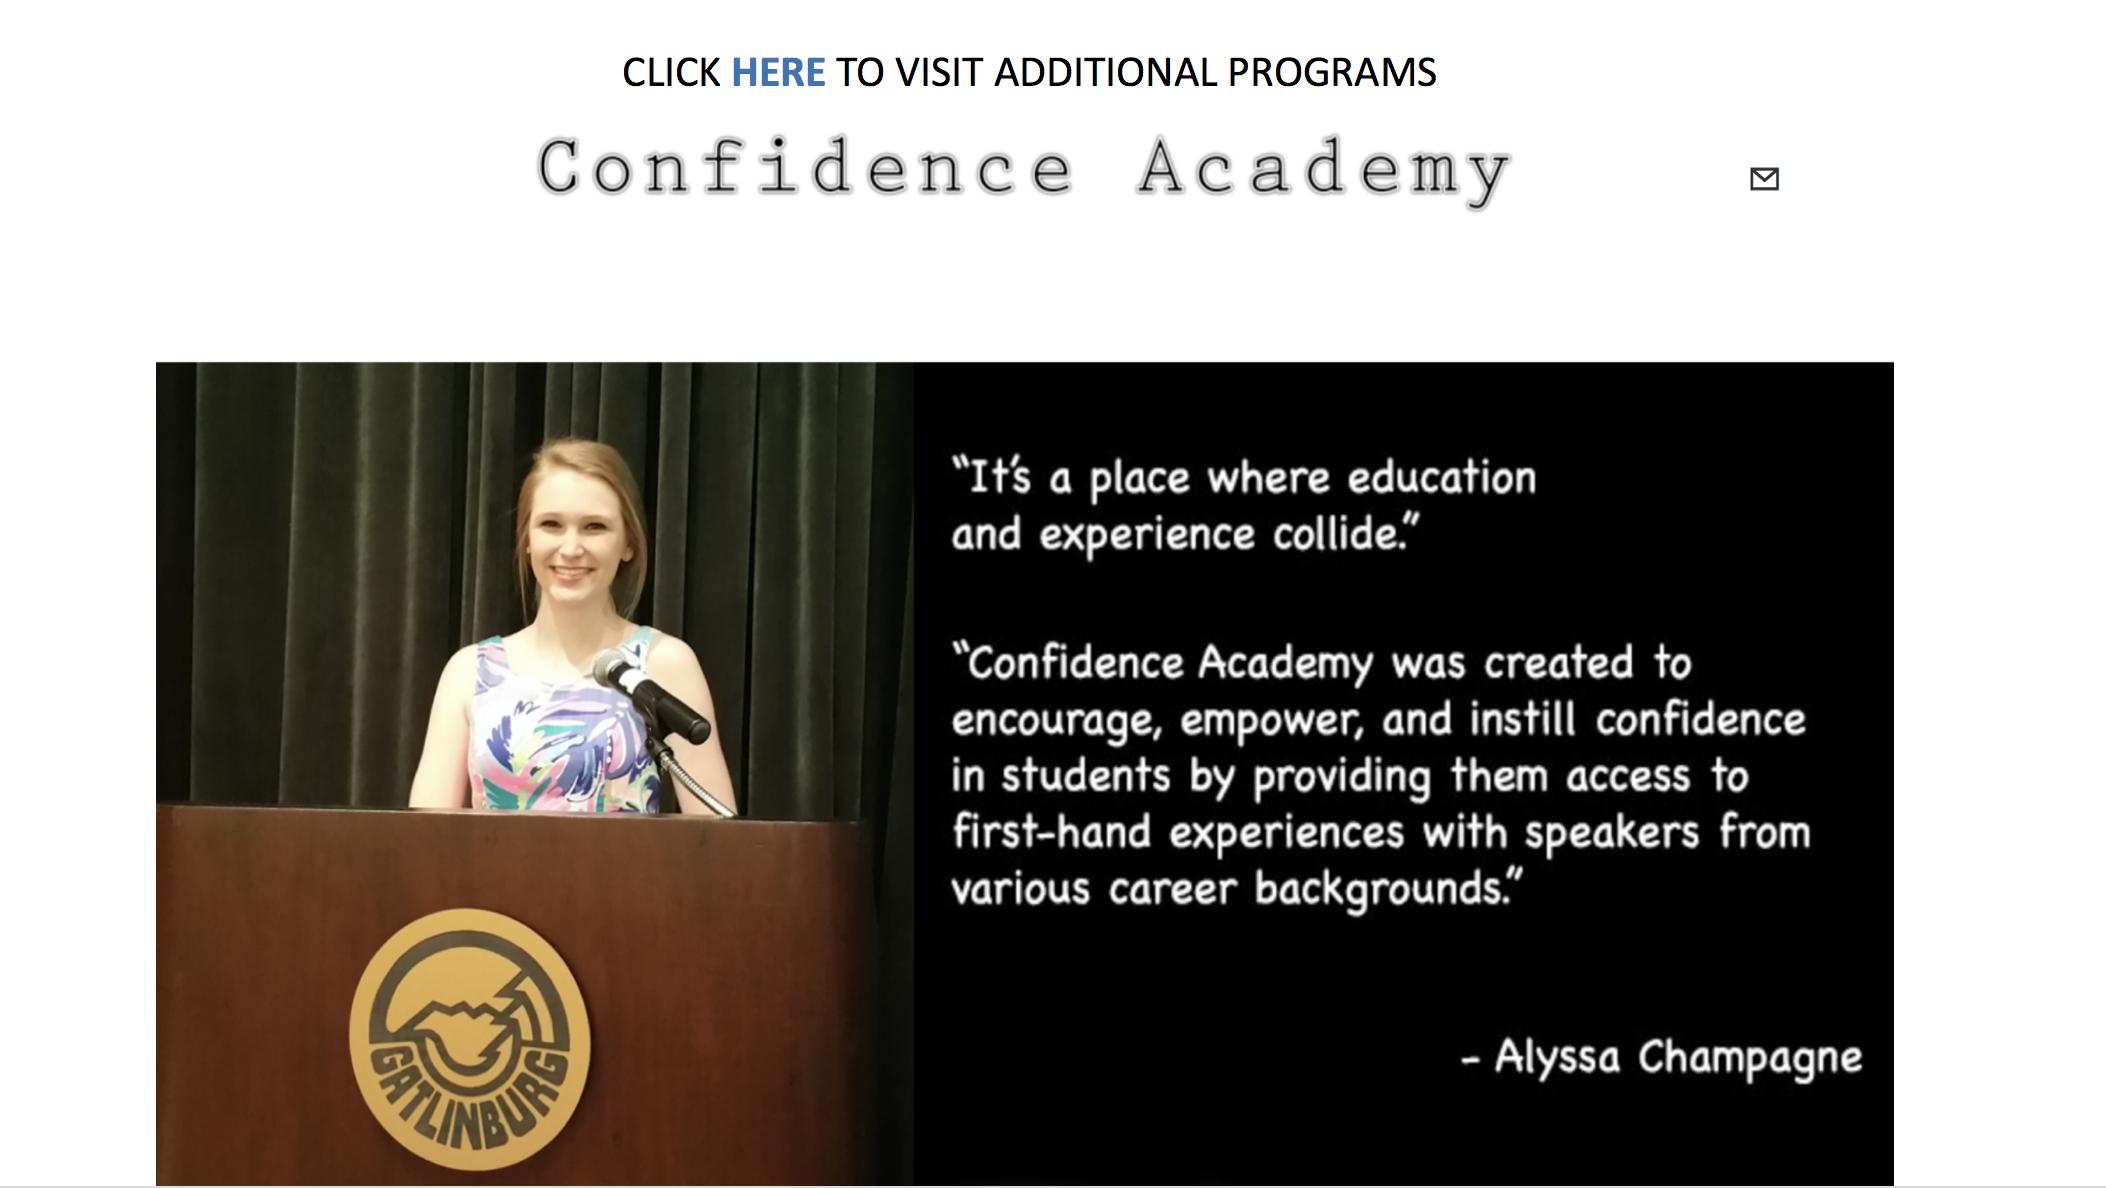 Alyssa Champagne Gatlinburg TN Confidence Academy confidenceacademy Gatlinburg-Pittman Sevierville TN.jpg